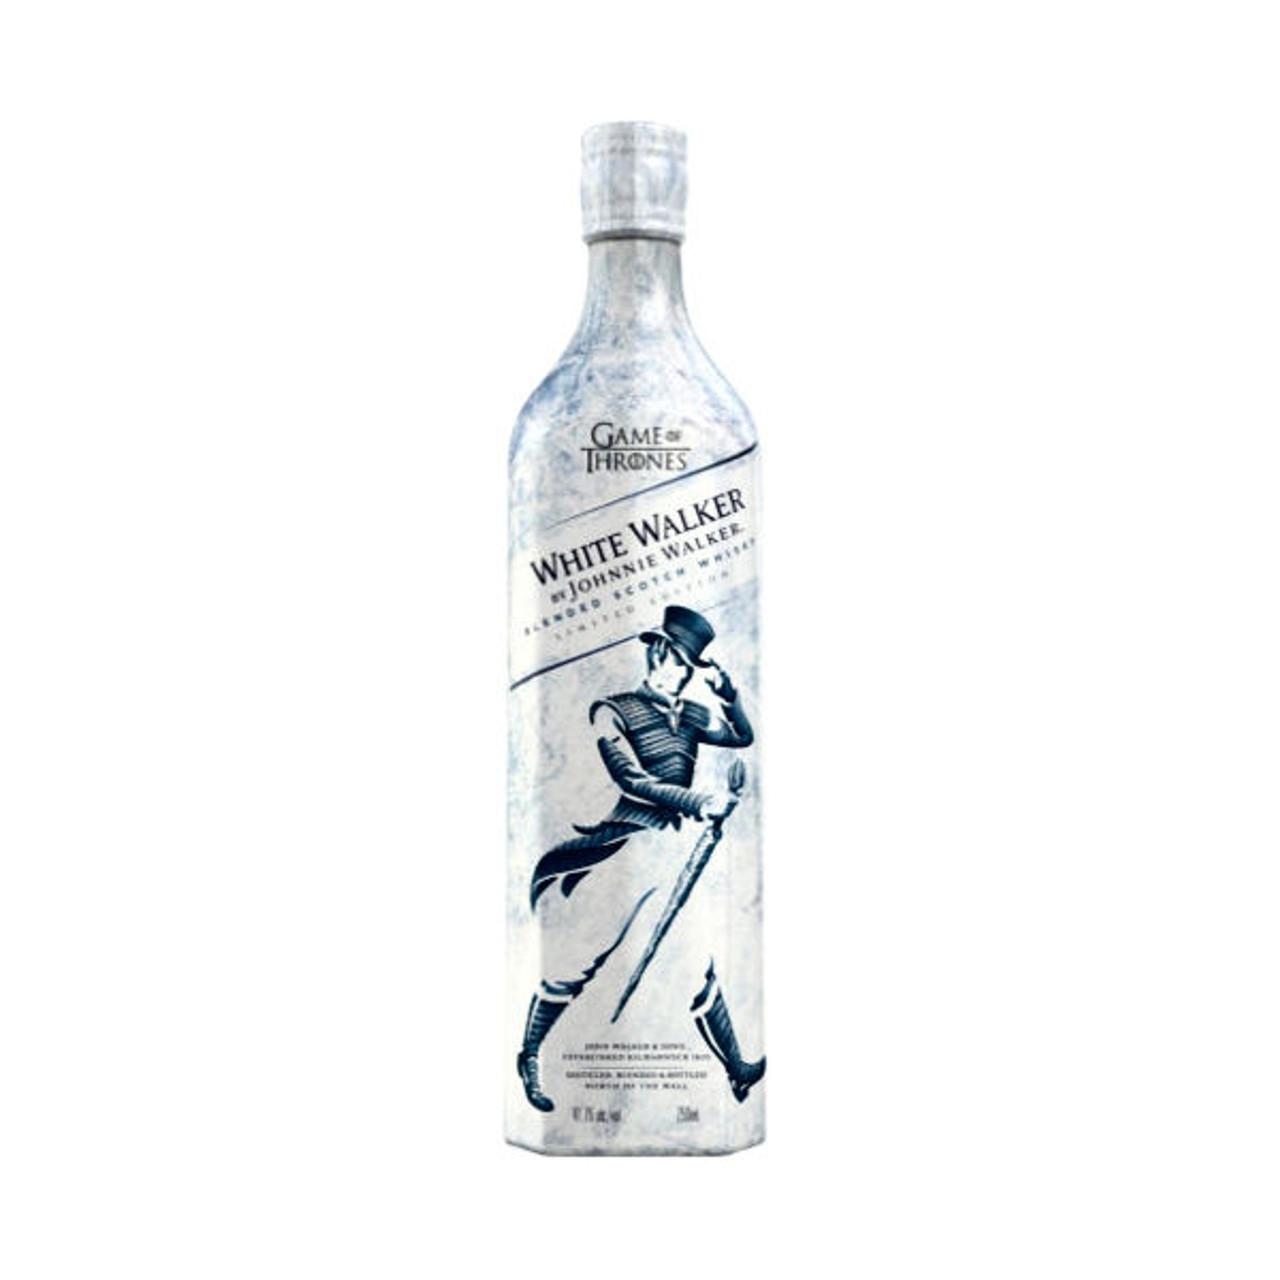 Johnnie Walker White Walker Game Of Thrones Blended Scotch 750ml